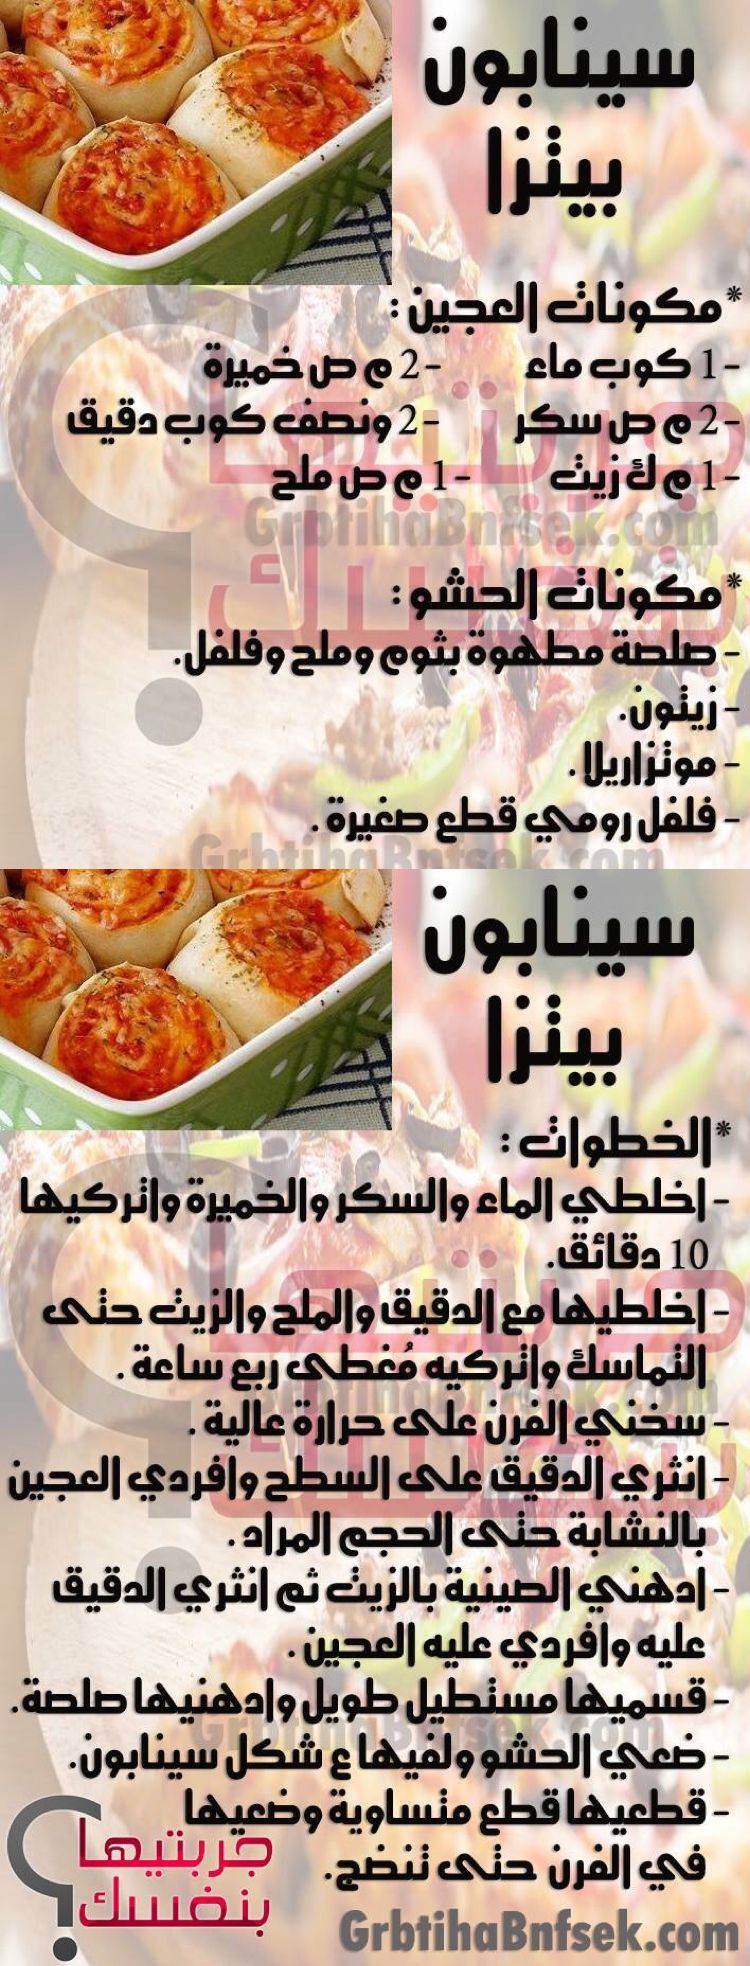 Pin By Carol Fawzy On Food Arabic Food Food Cooking